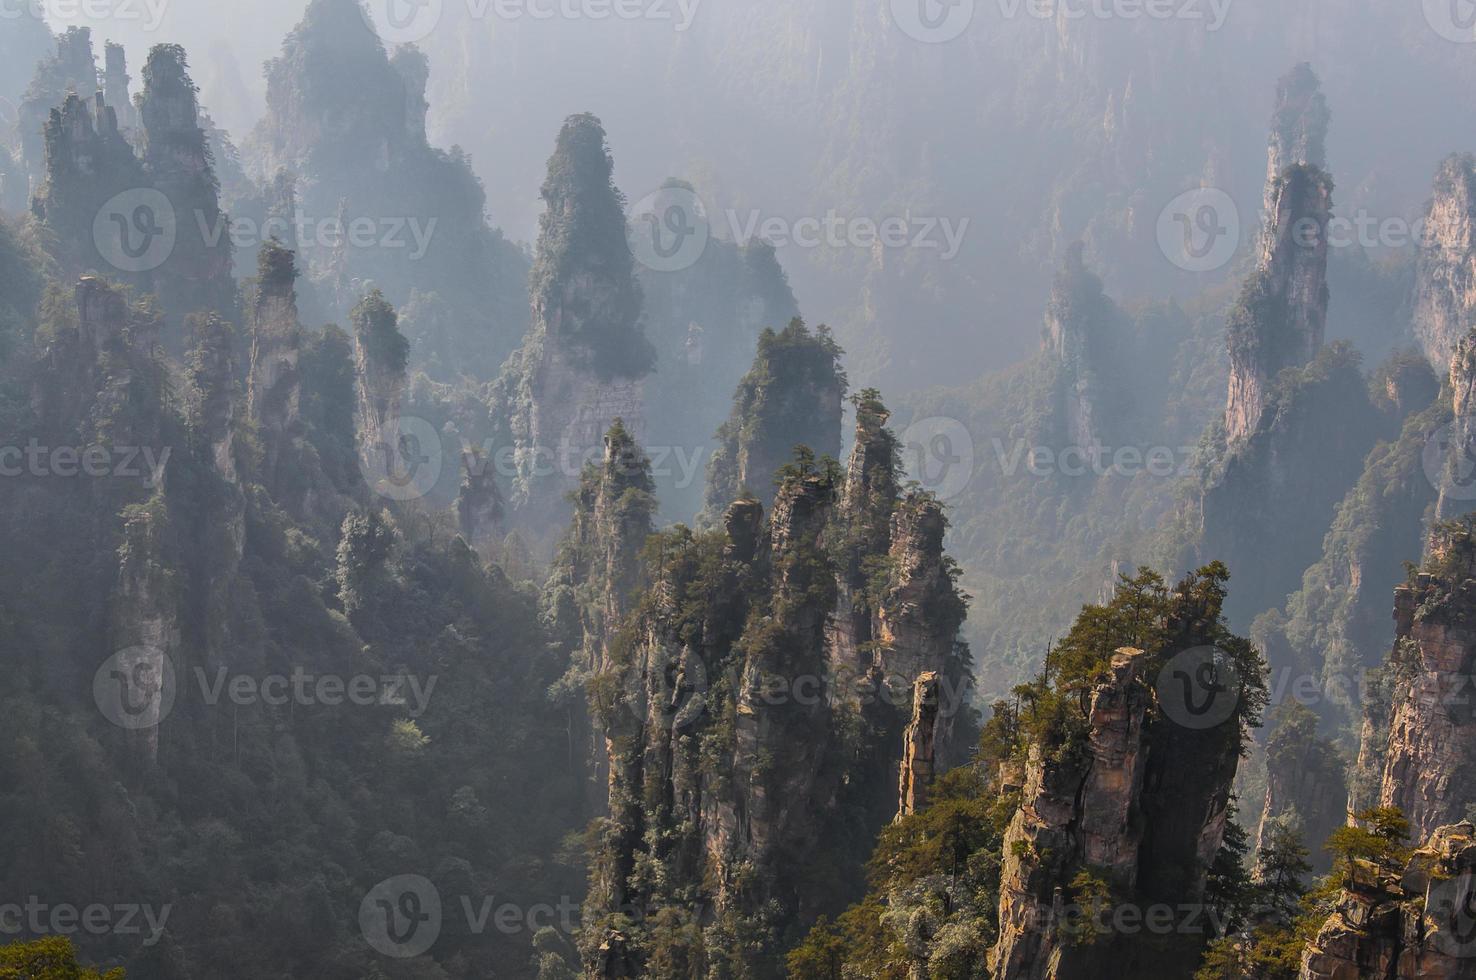 Zhangjiajie national geological Forest Park photo